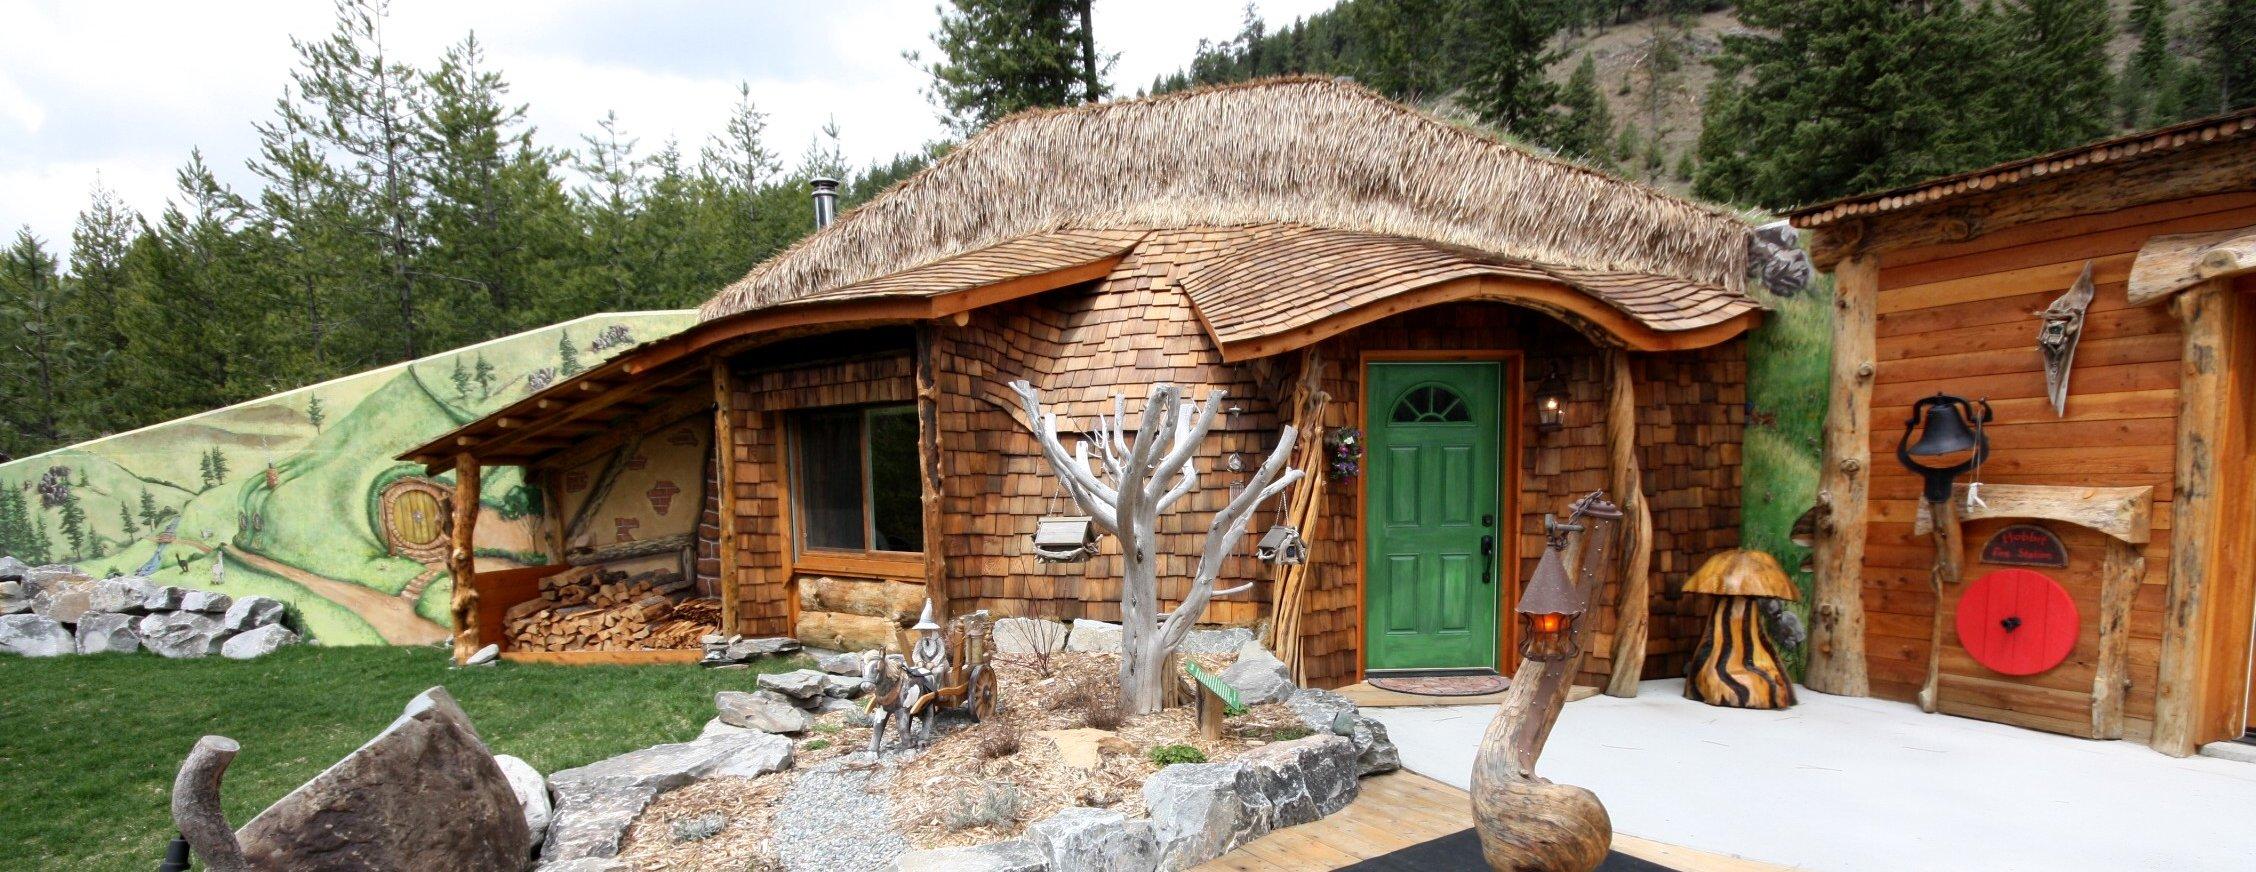 The Shire of Montana – hobbit home